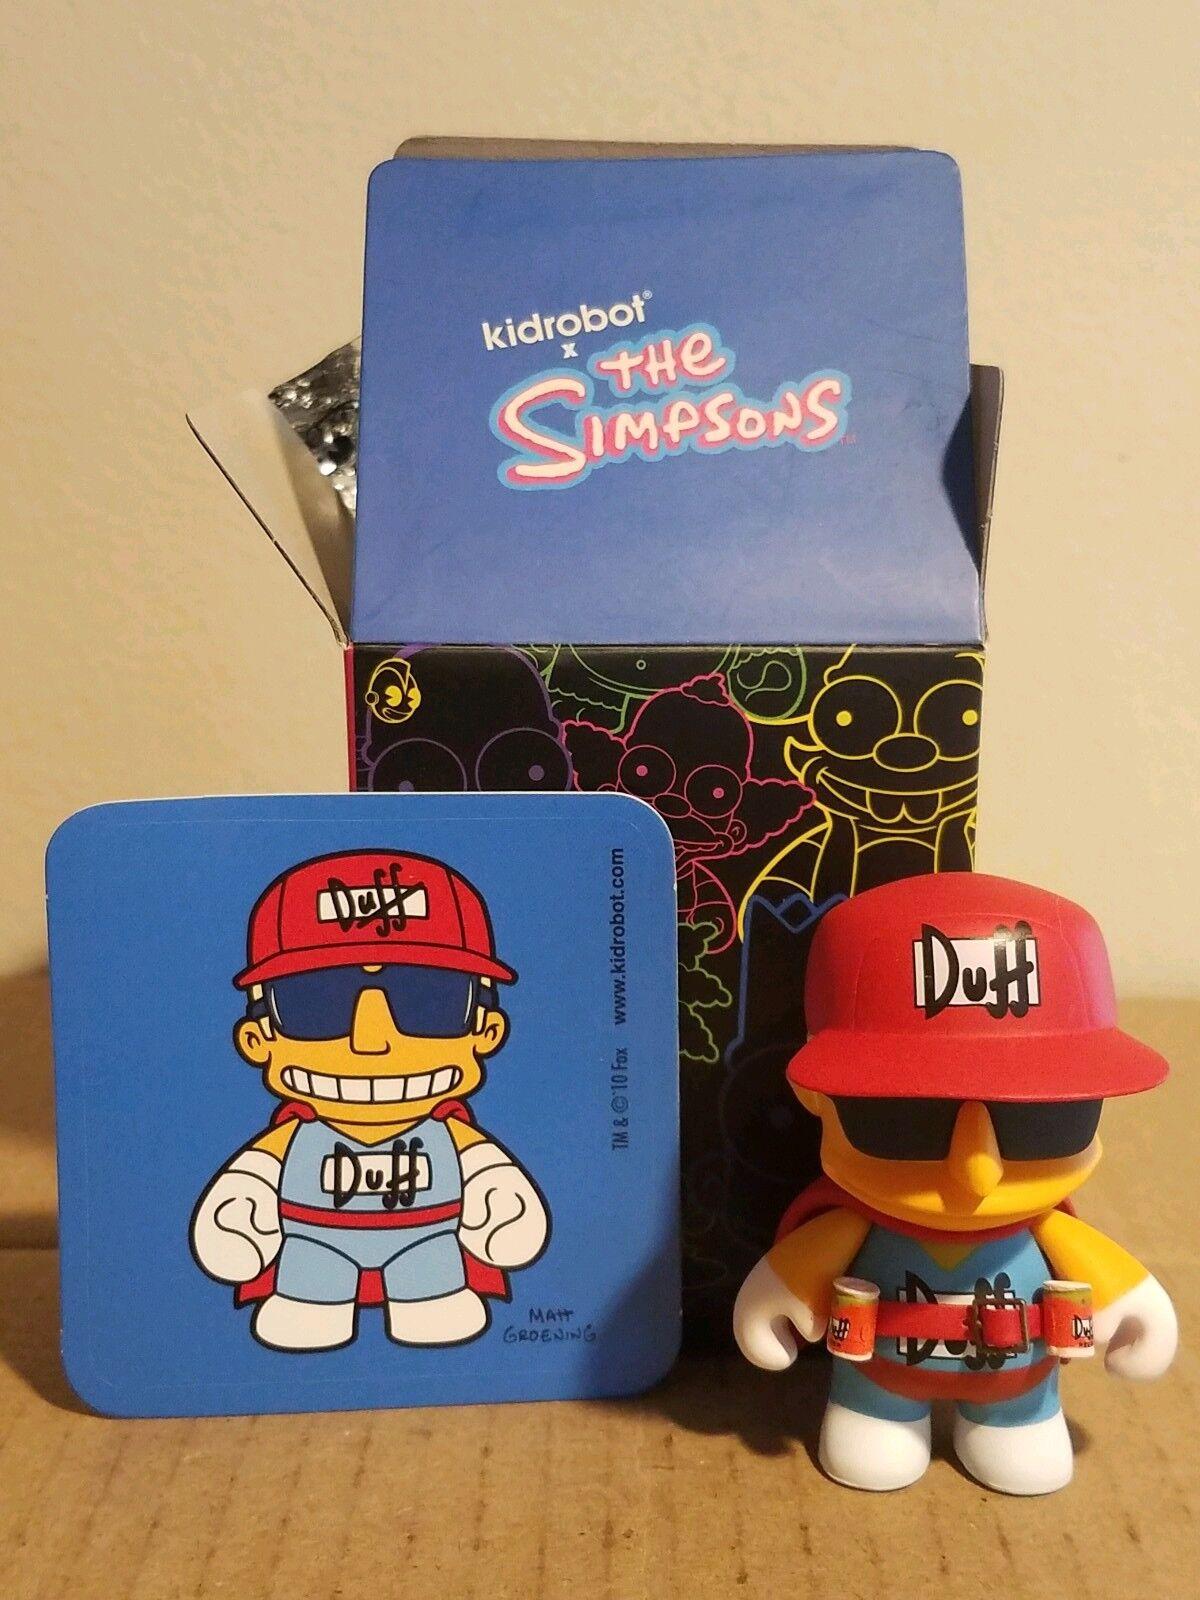 Kidrobot Simpsons Series 1 Duffman Duffman Duffman Vinyl Figure 463f61